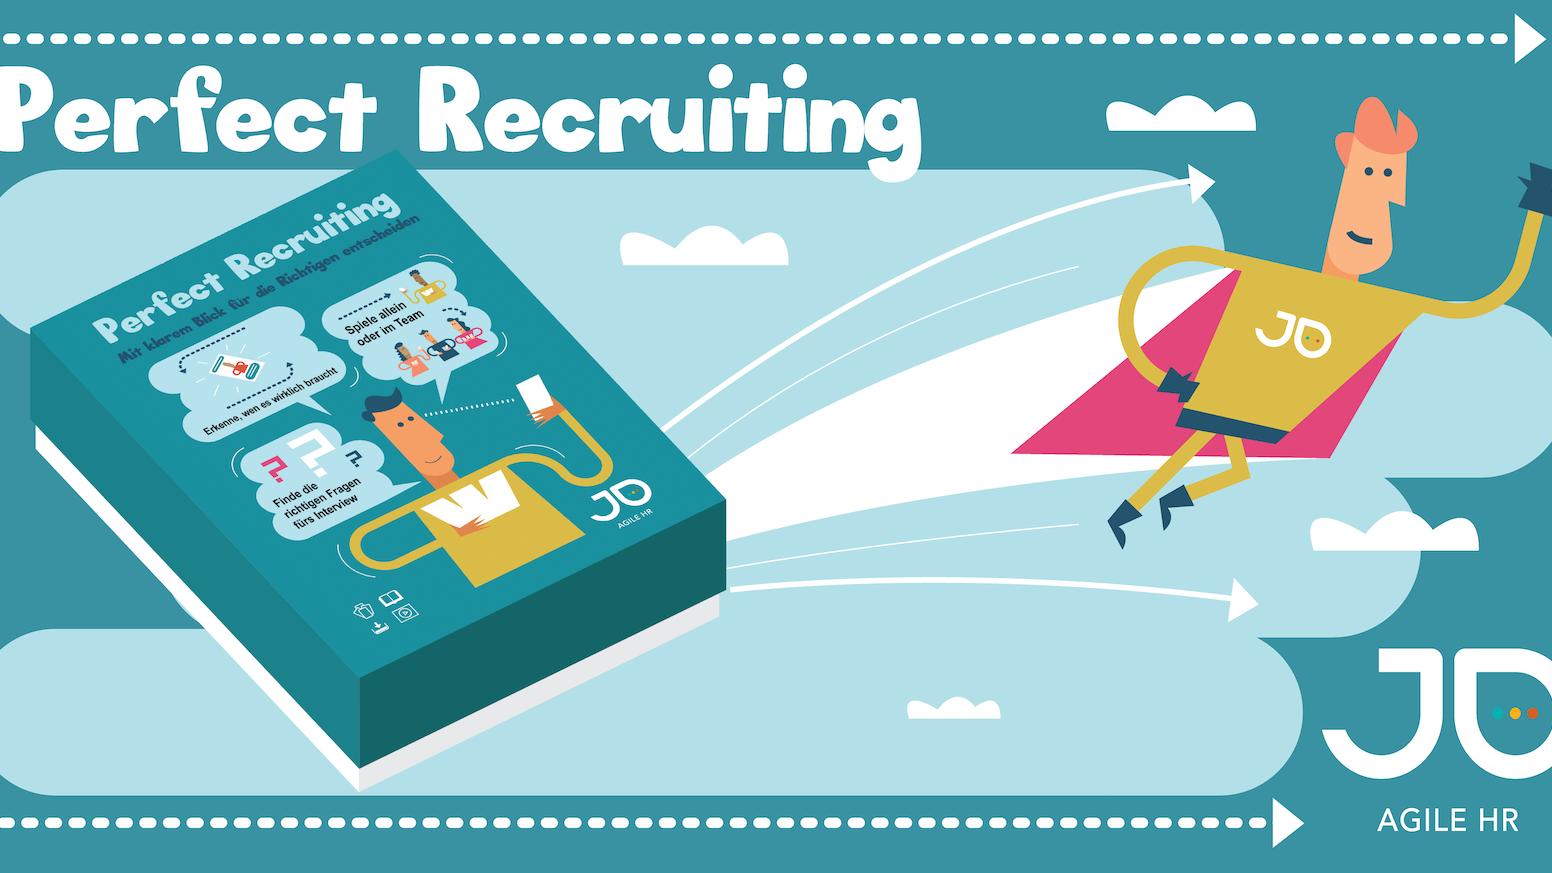 Agile Spiele perfect recruitingjens olberding — kickstarter